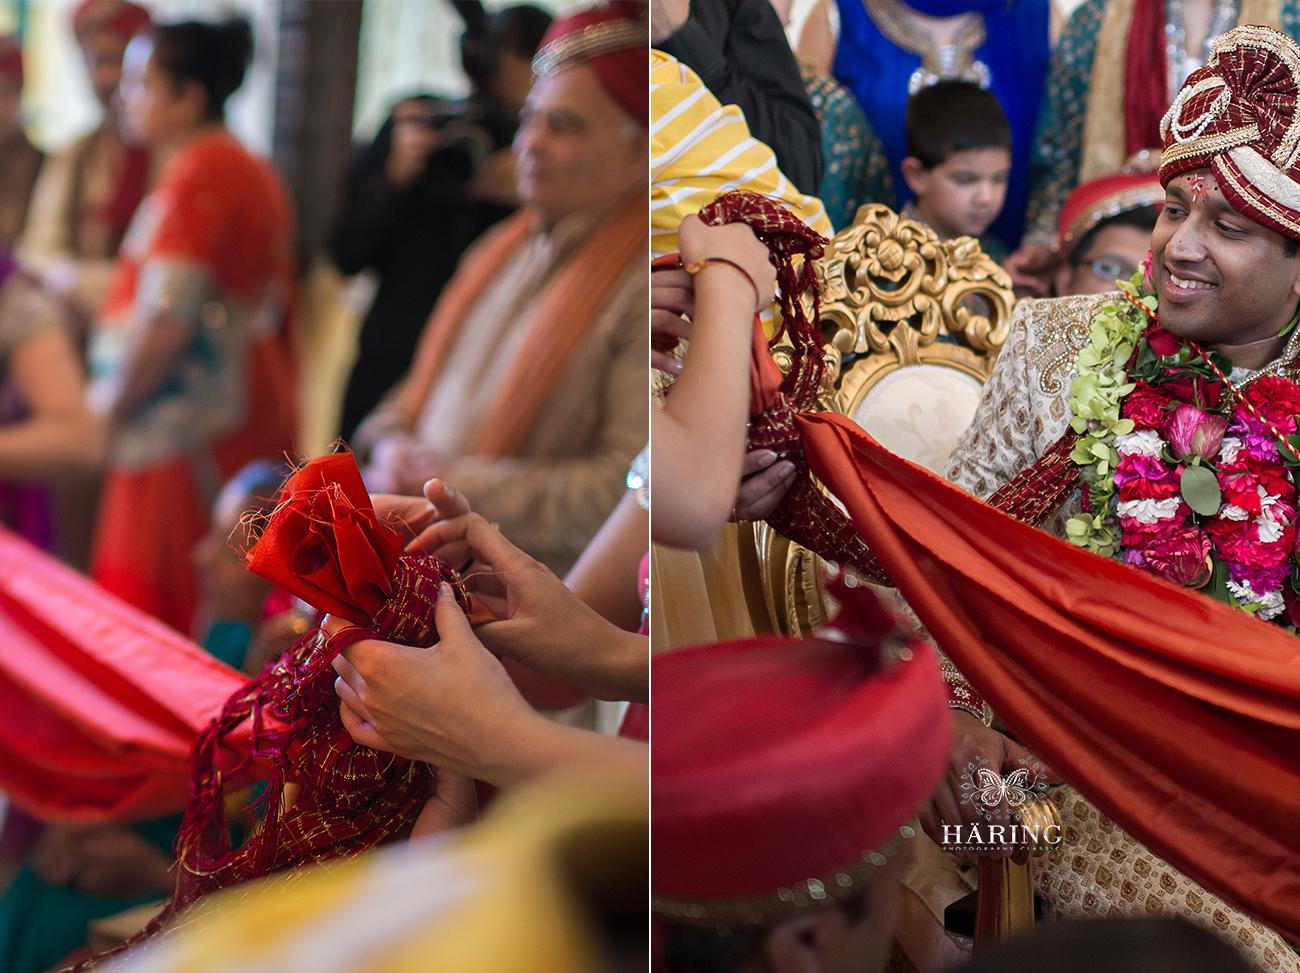 Sheetal + Guru | Hindu Indian Wedding Photos | Hindu Temple of Southwest Florida | Reception: Harborside Event Center, Miami Wedding Photographers | Häring Photography, Indian Wedding Photographer in Florida, Best Muslim, Hindu - South East Asian Wedding Photographers